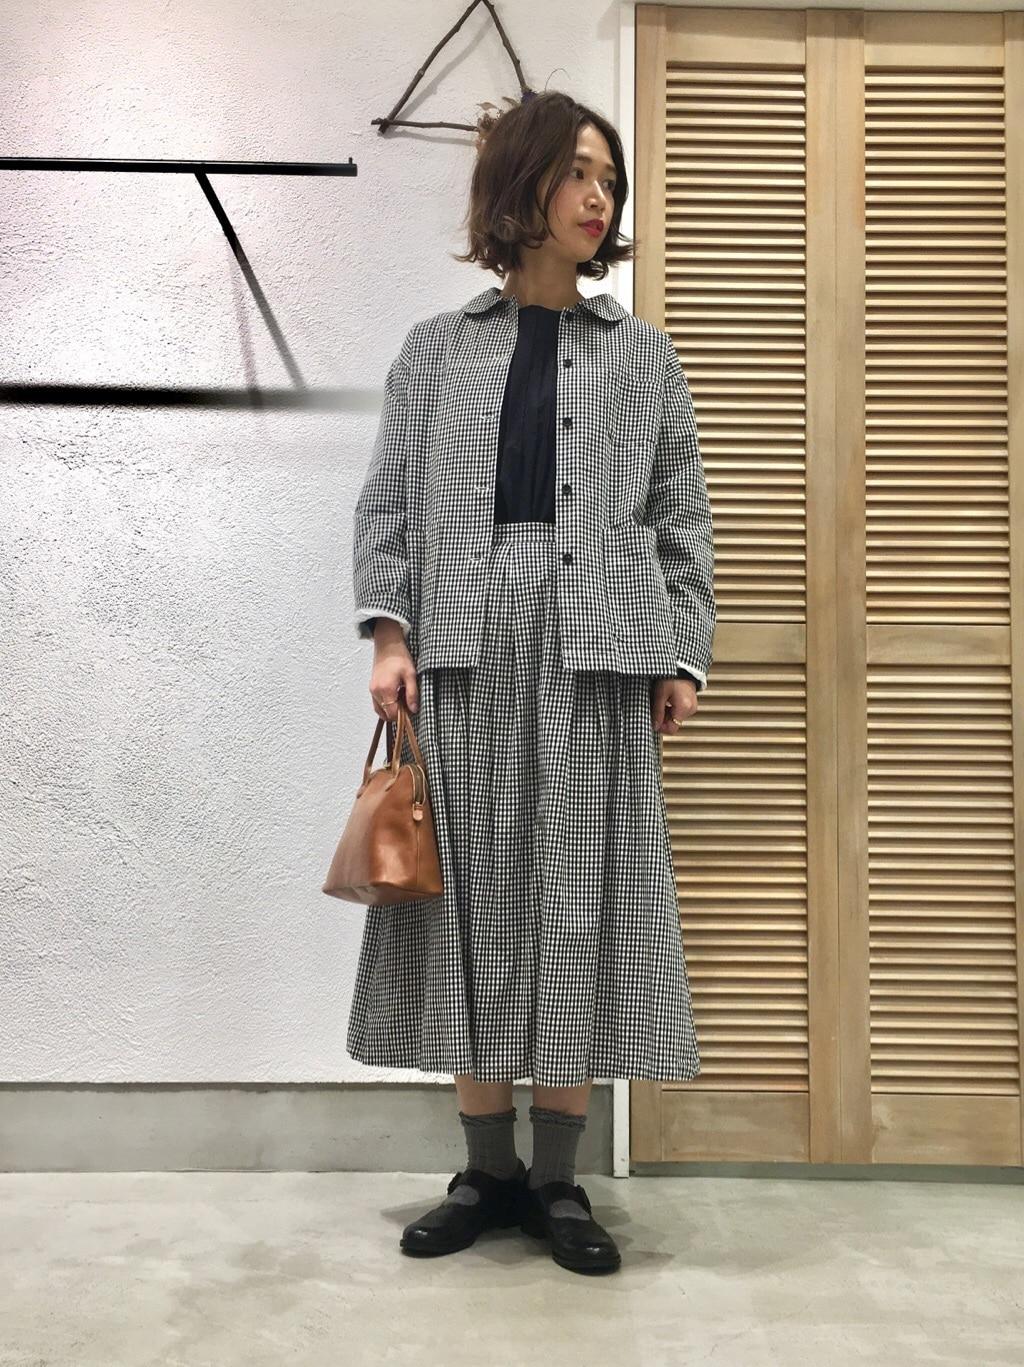 chambre de charme 横浜ジョイナス 身長:160cm 2021.02.21